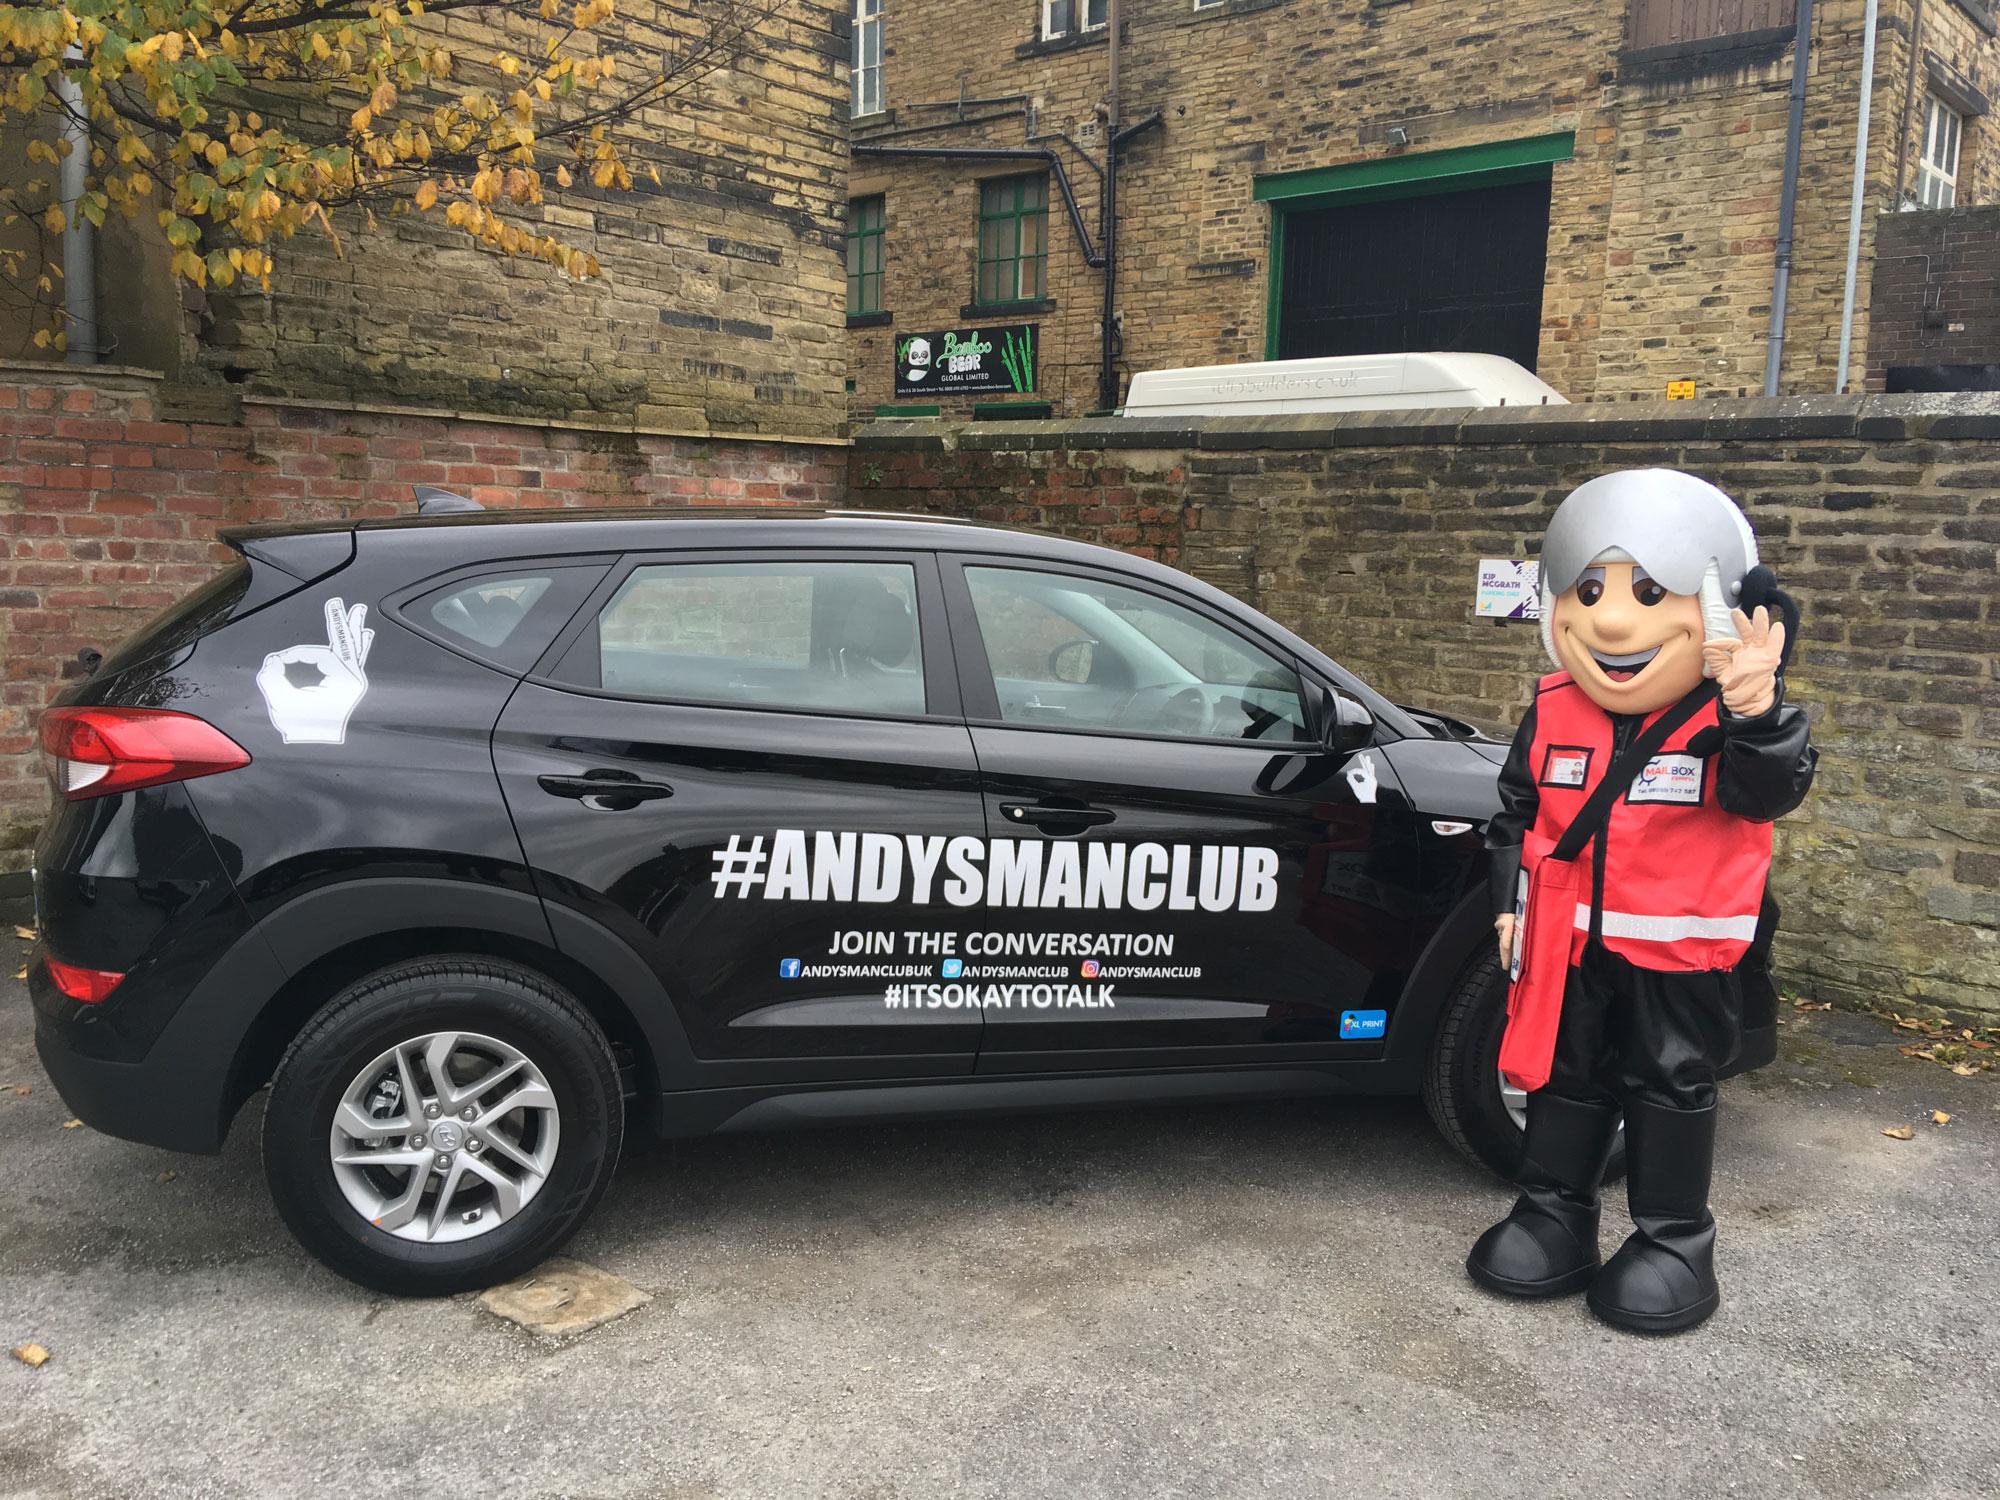 Black car with andysmanclub hashtag next to Mailbox mascot